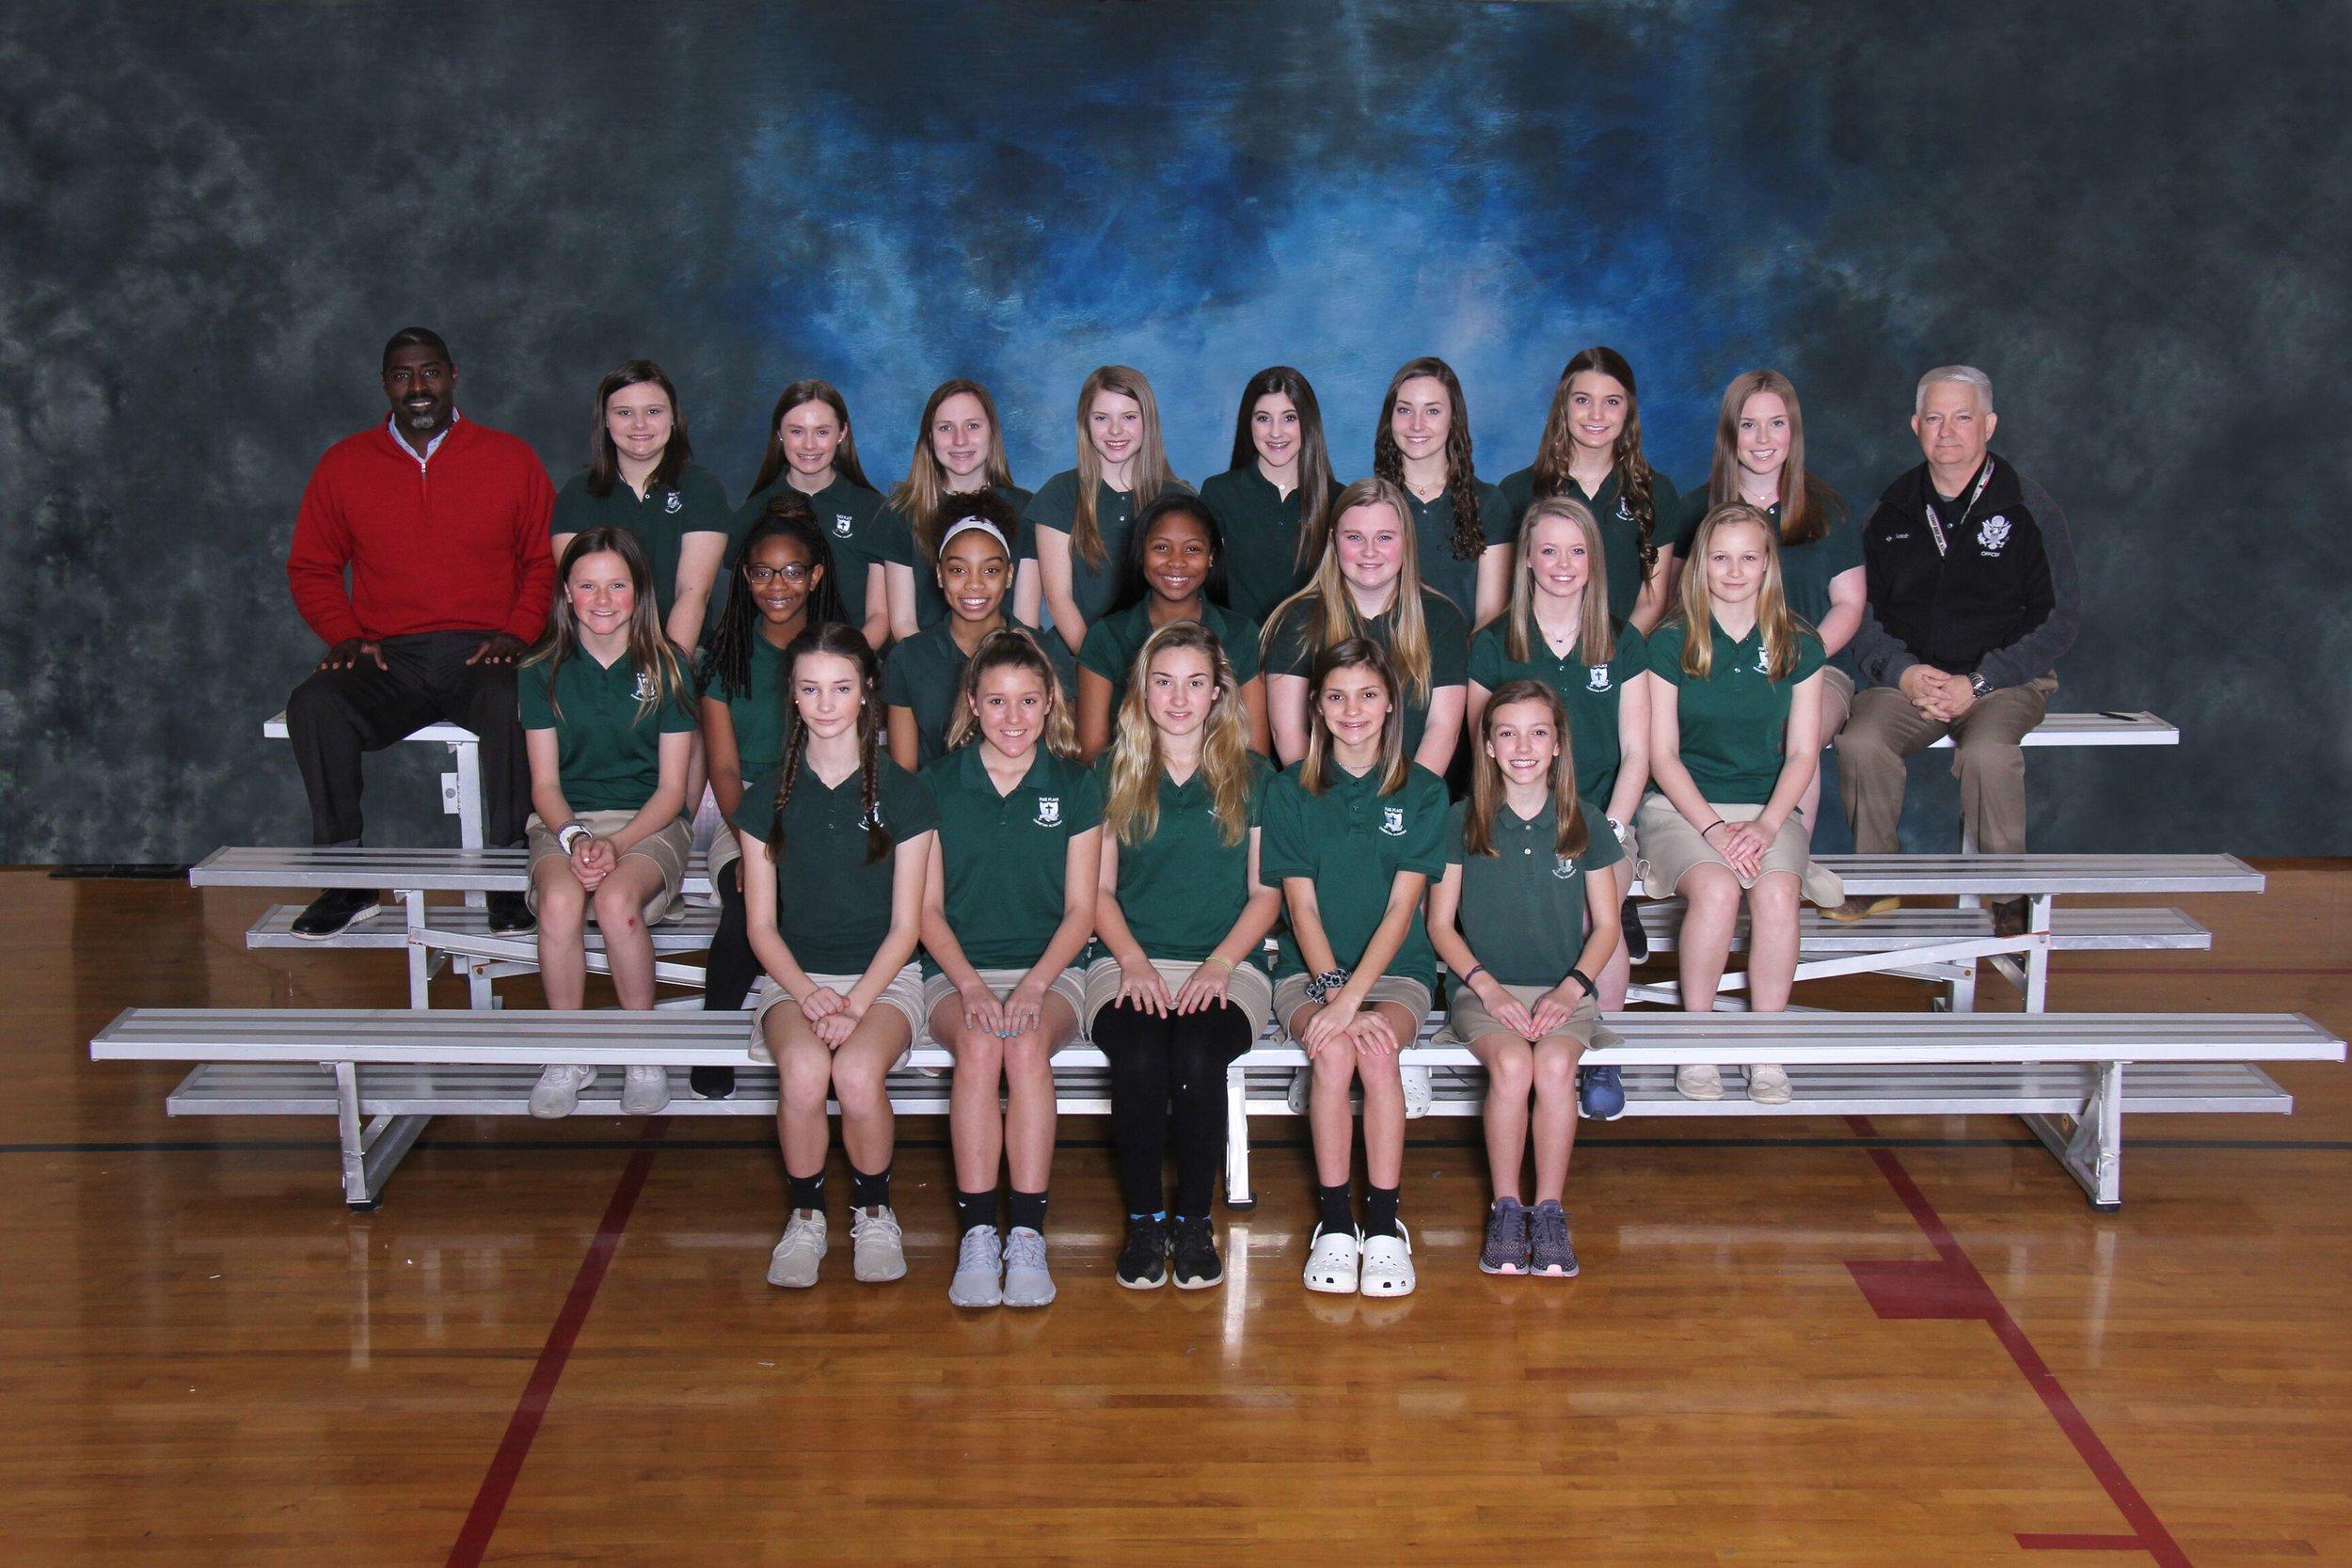 2019 JV Girls Track Team